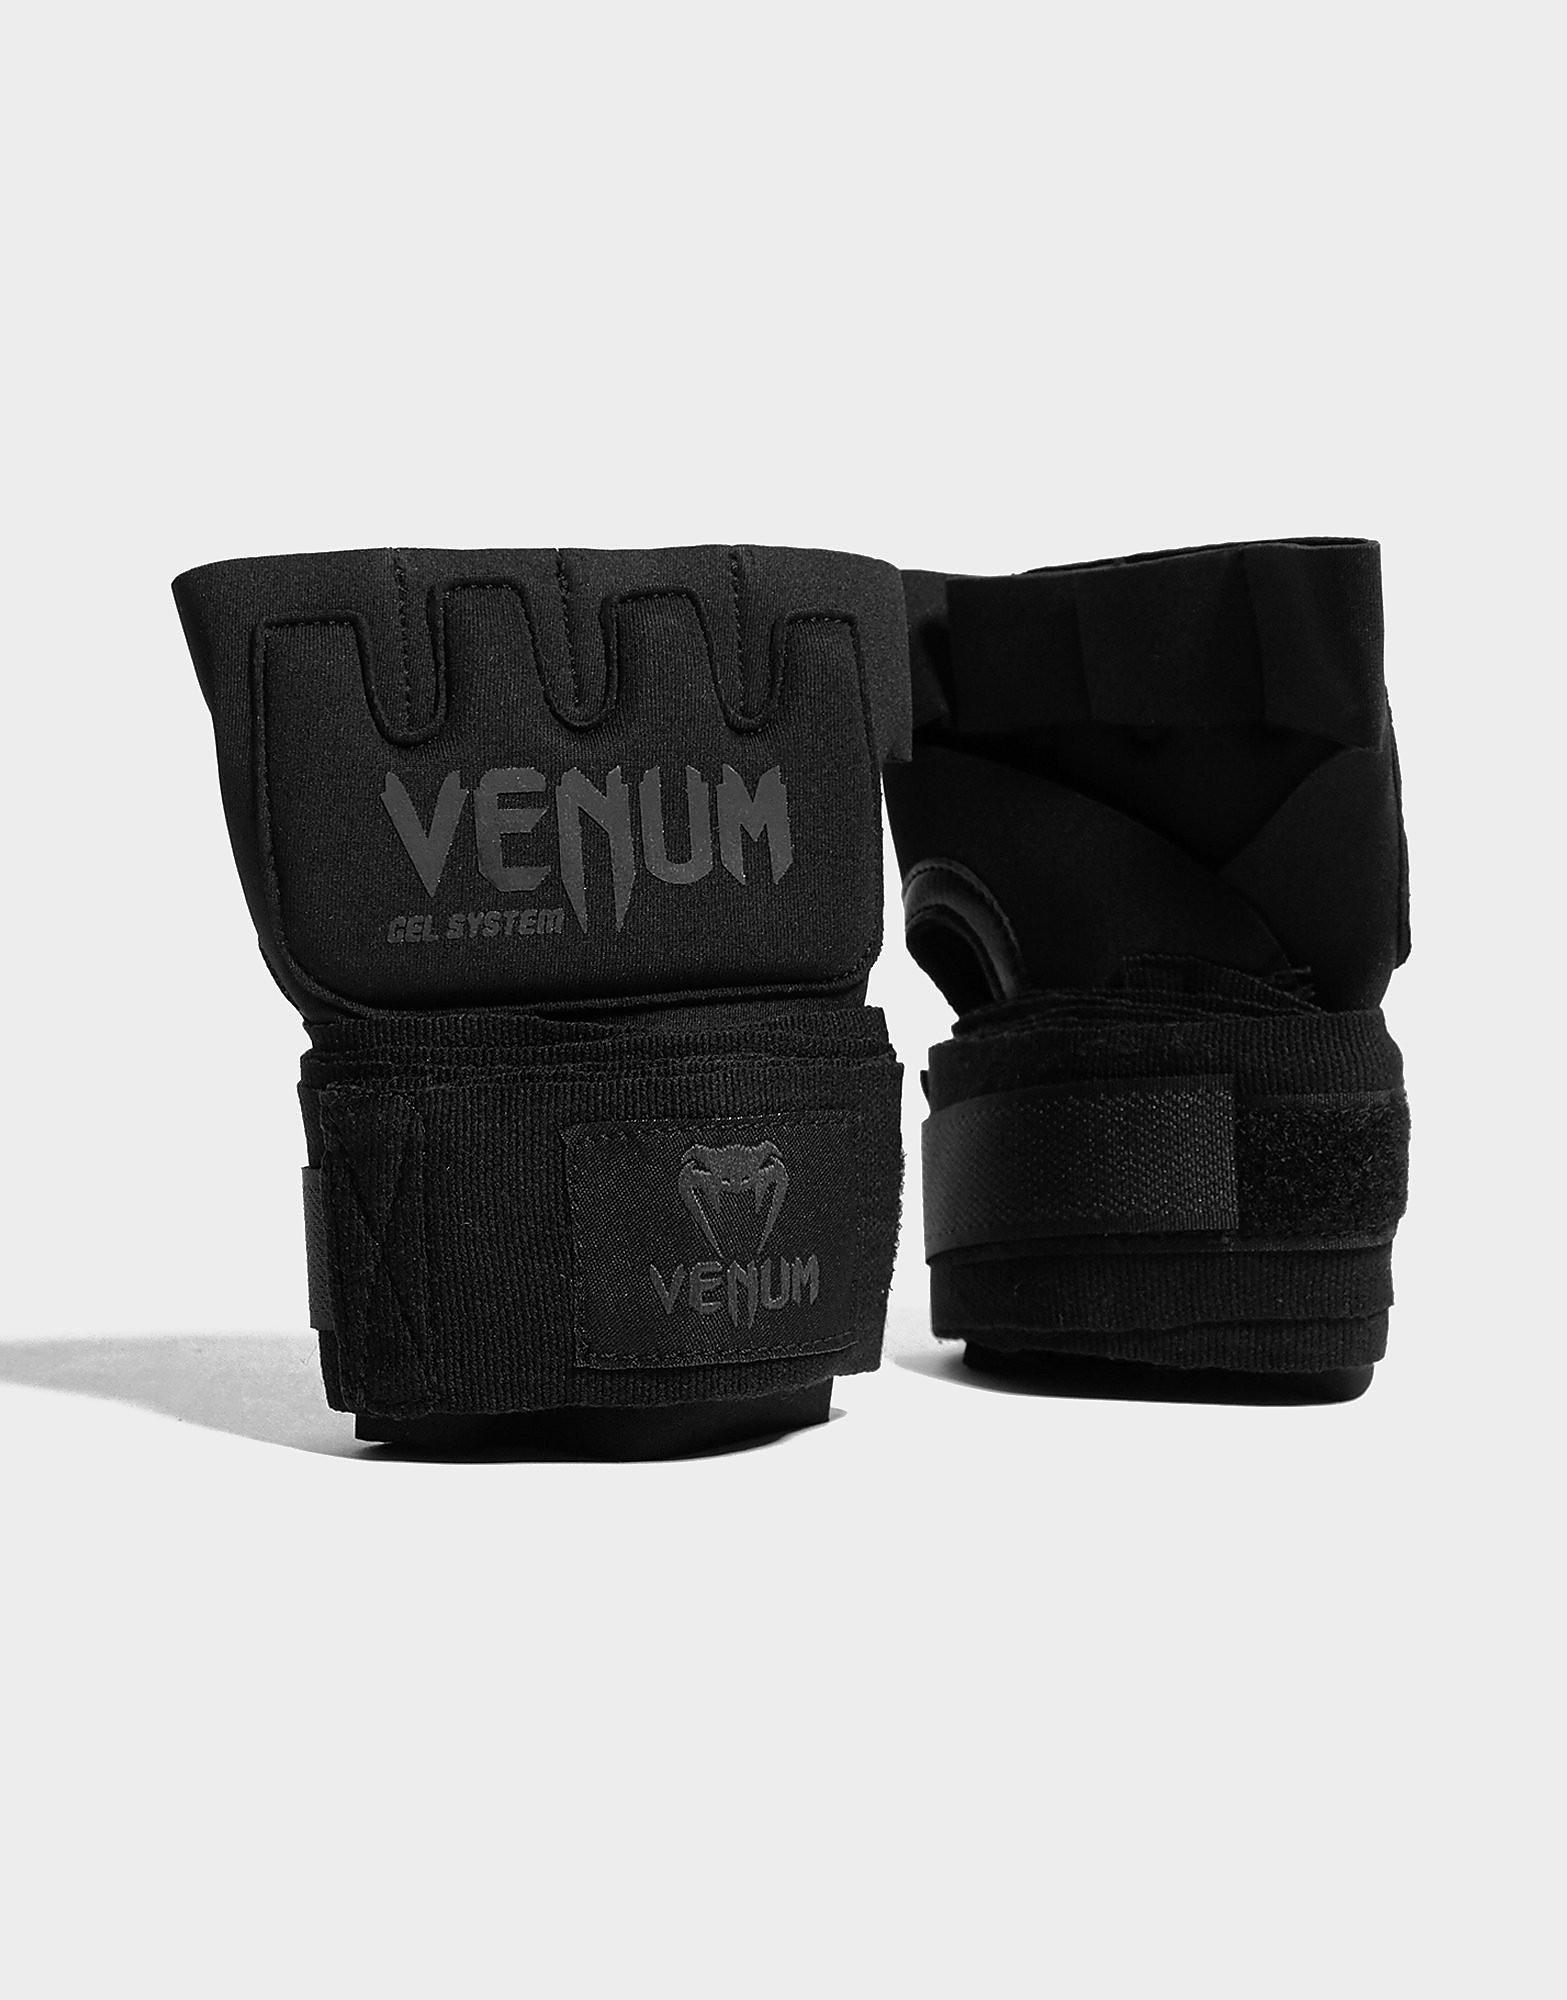 Venum Gel Glove Wraps - Zwart - Heren